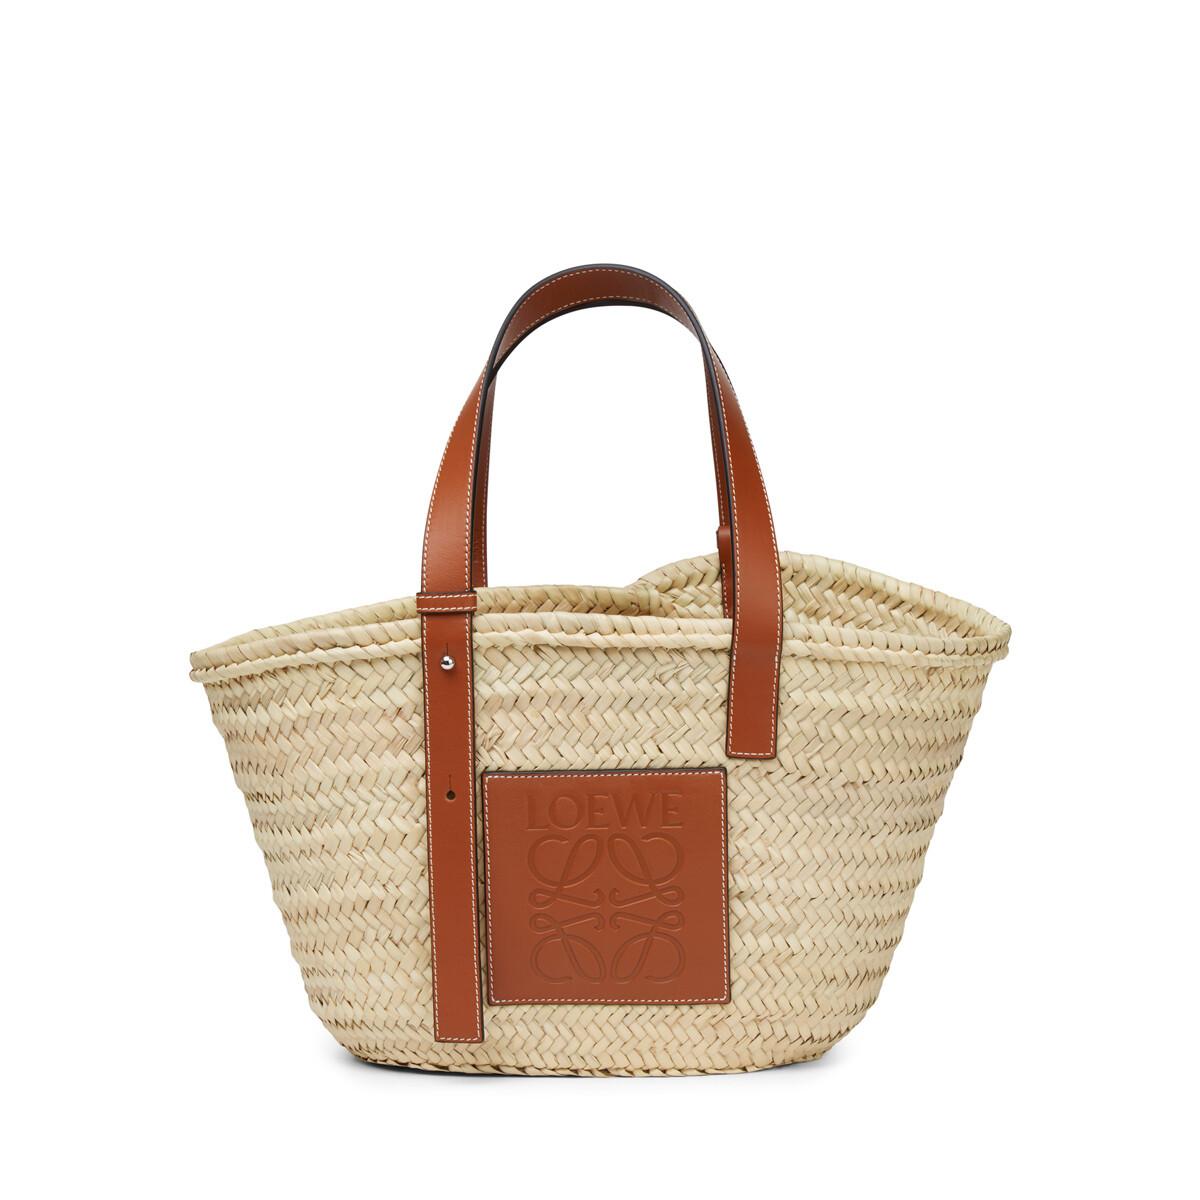 LOEWE Basket Natural/Tan front